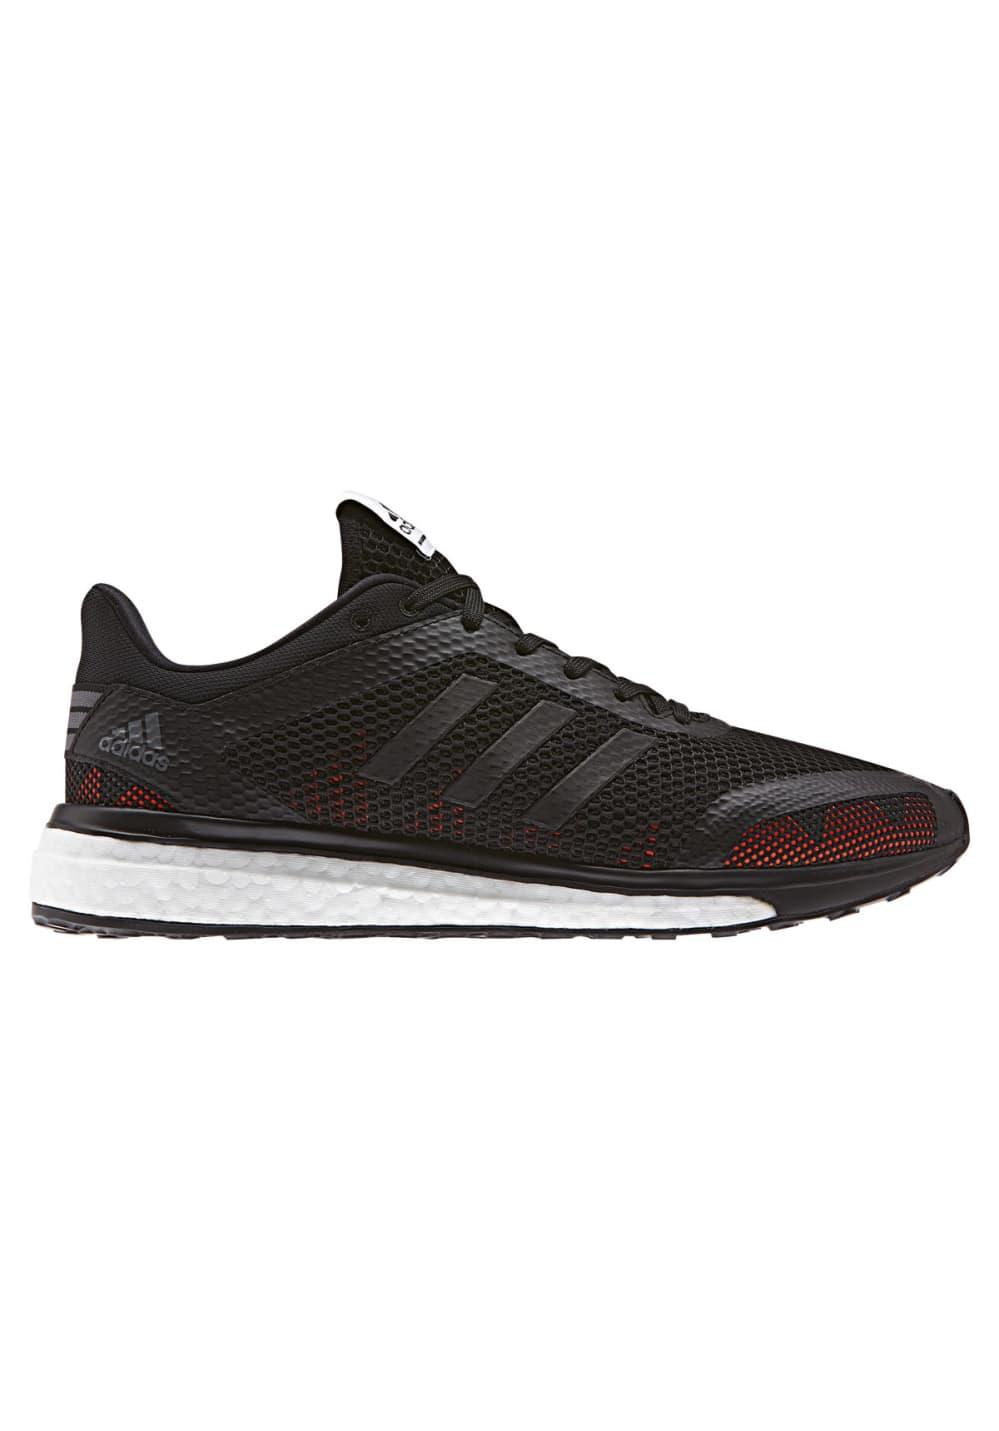 best sneakers 875a0 83247 adidas-response-plus-laufschuhe-herren-schwarz-pid-000000000010130788.jpg